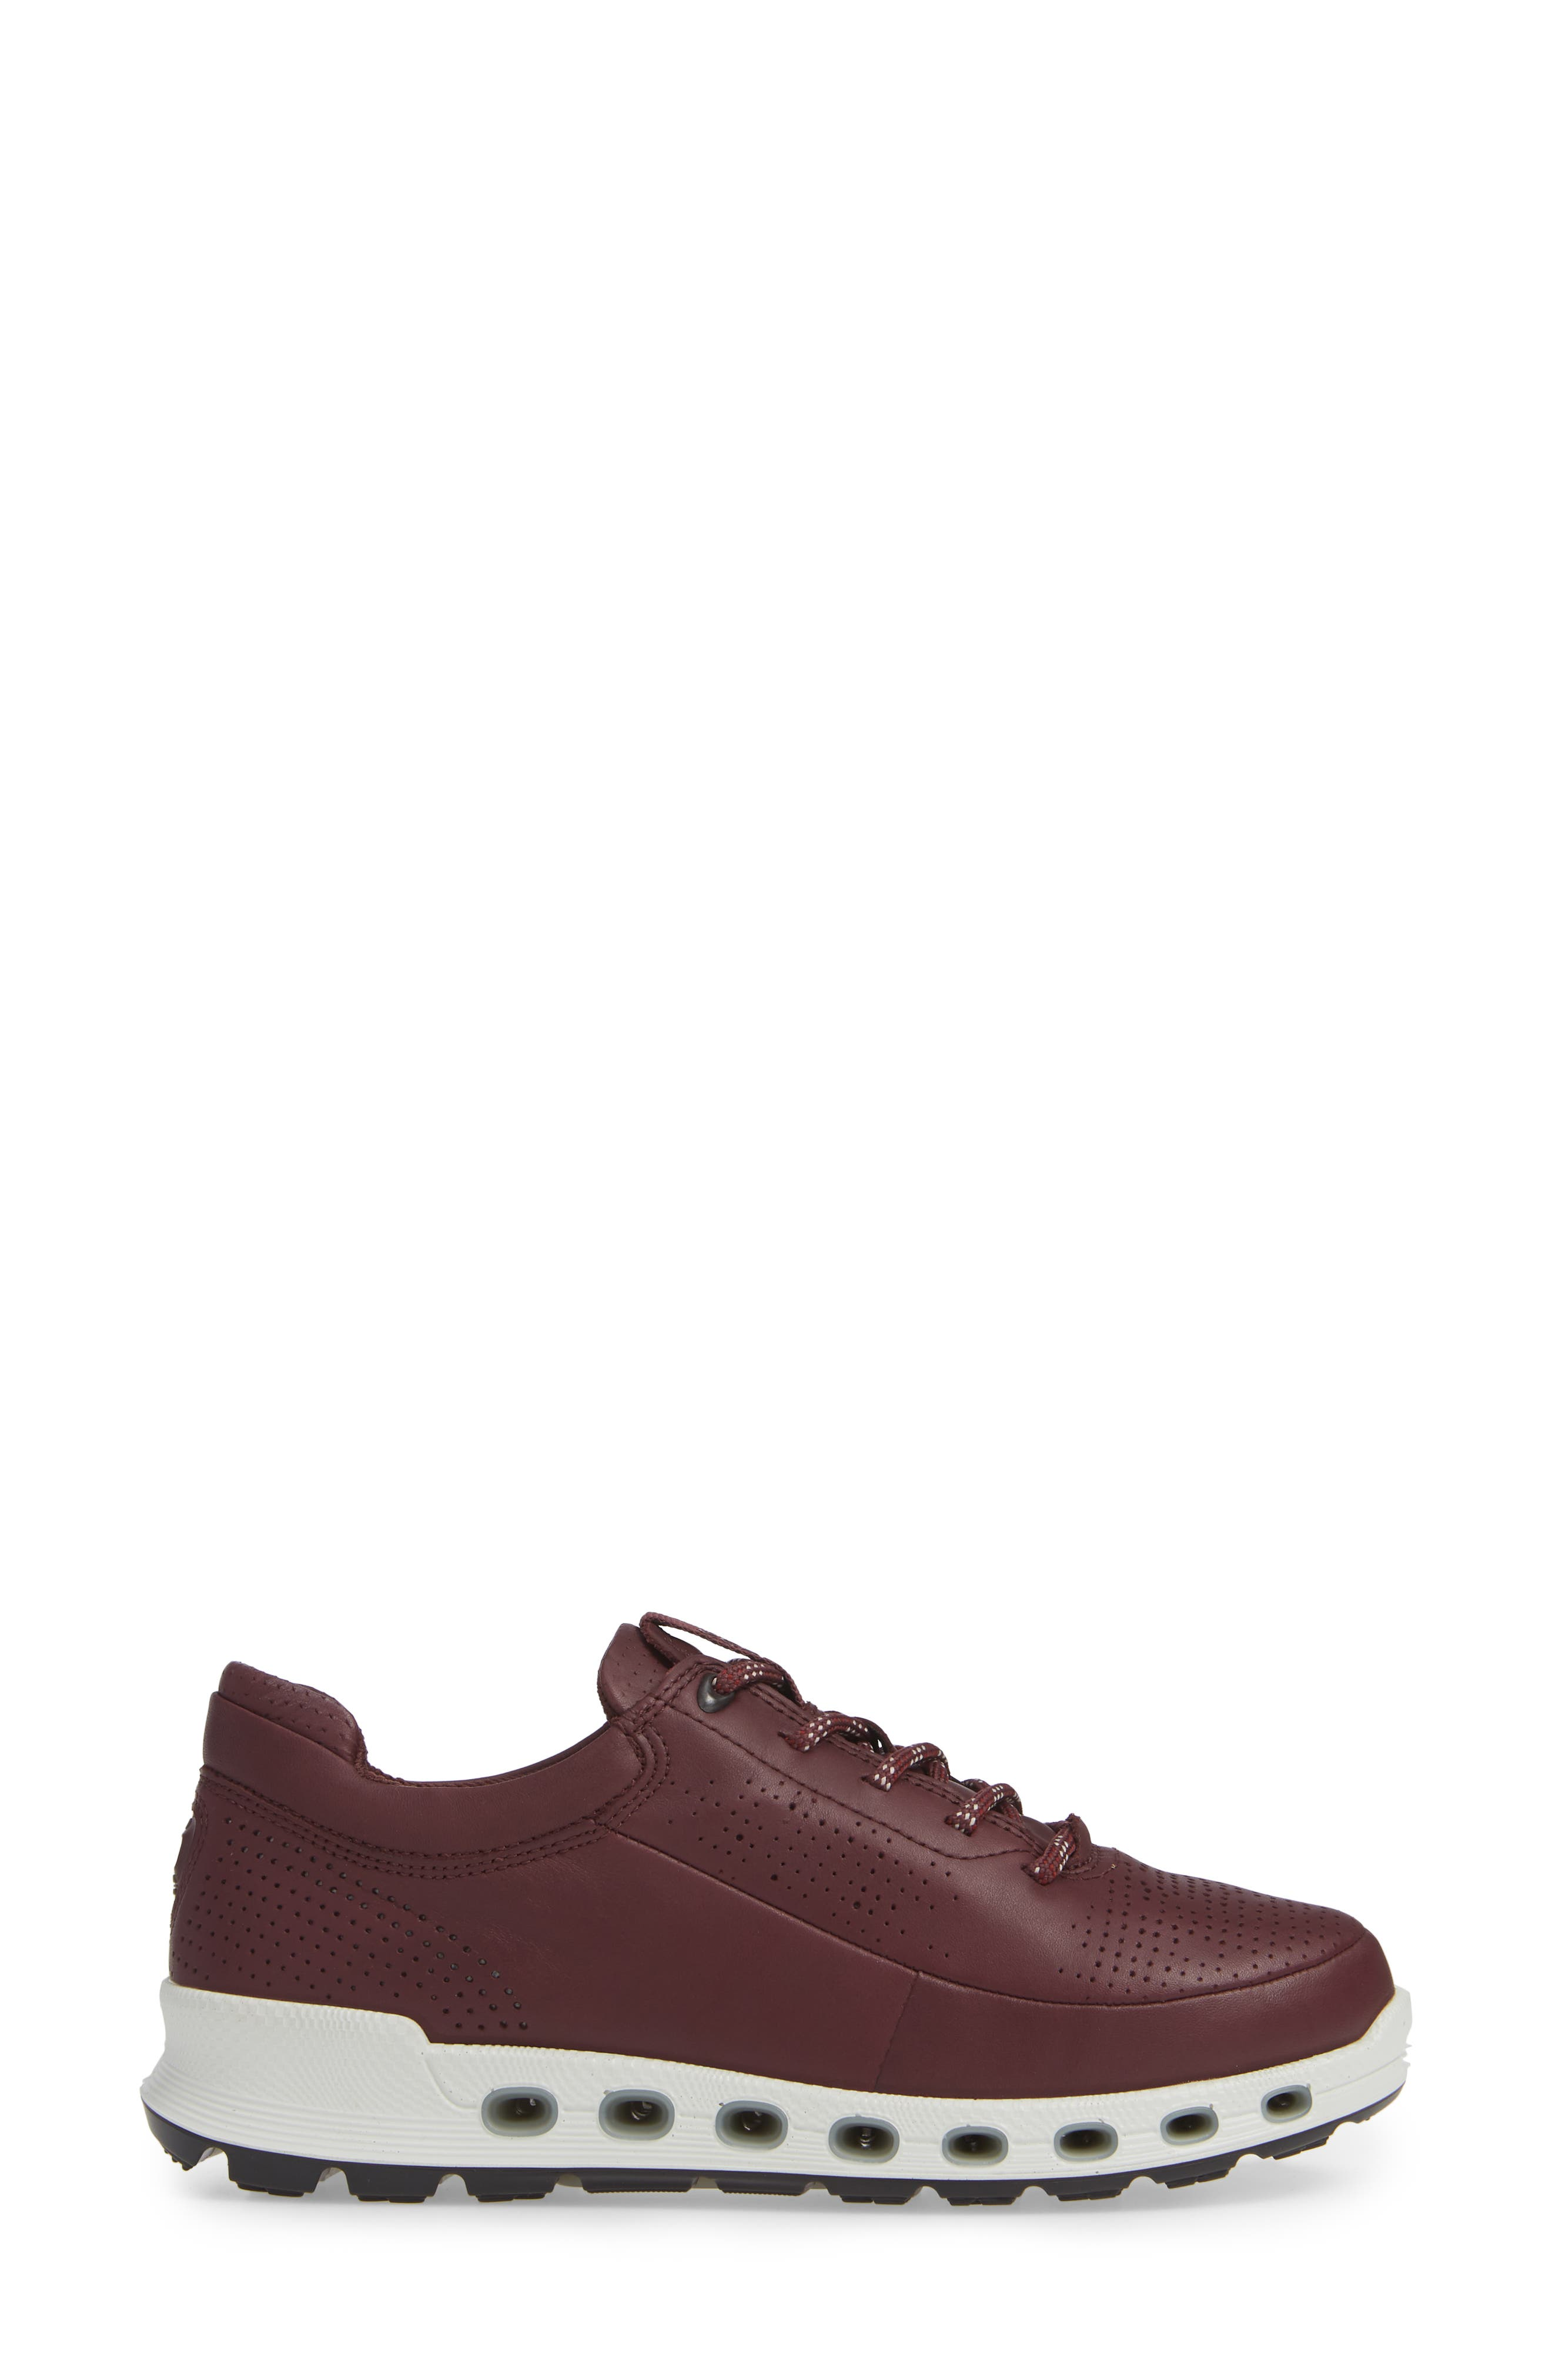 Cool 2.0 GTX Waterproof Sneaker,                             Alternate thumbnail 3, color,                             WINE LEATHER